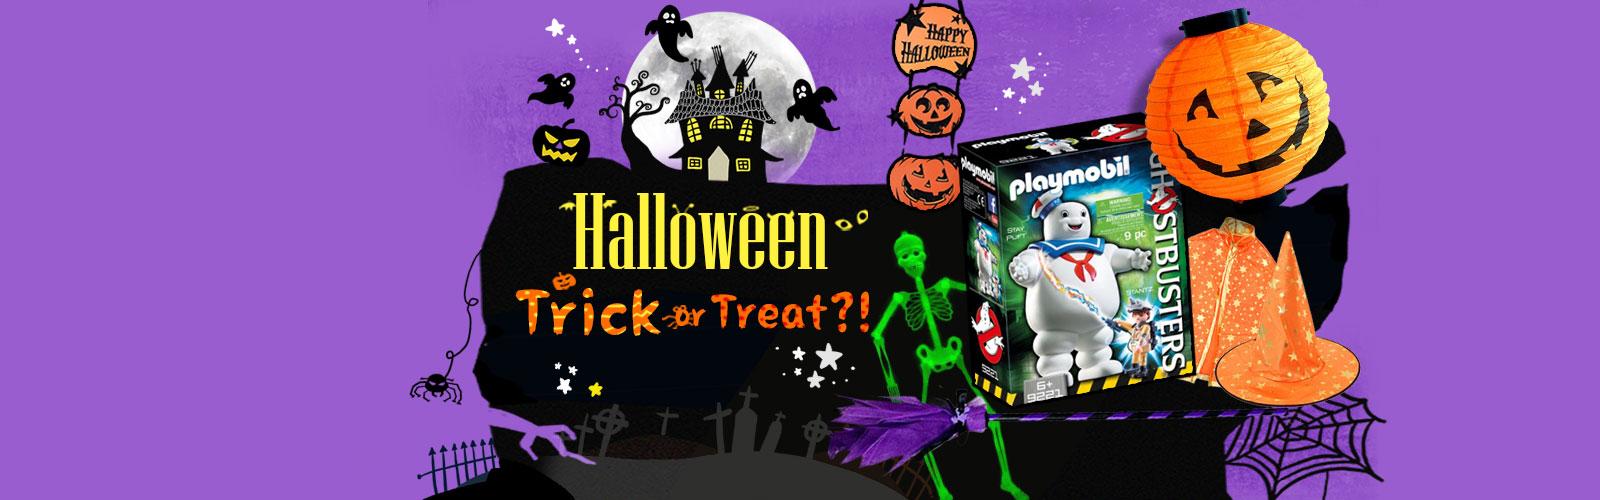 Happy Halloween! Trick or Treat~